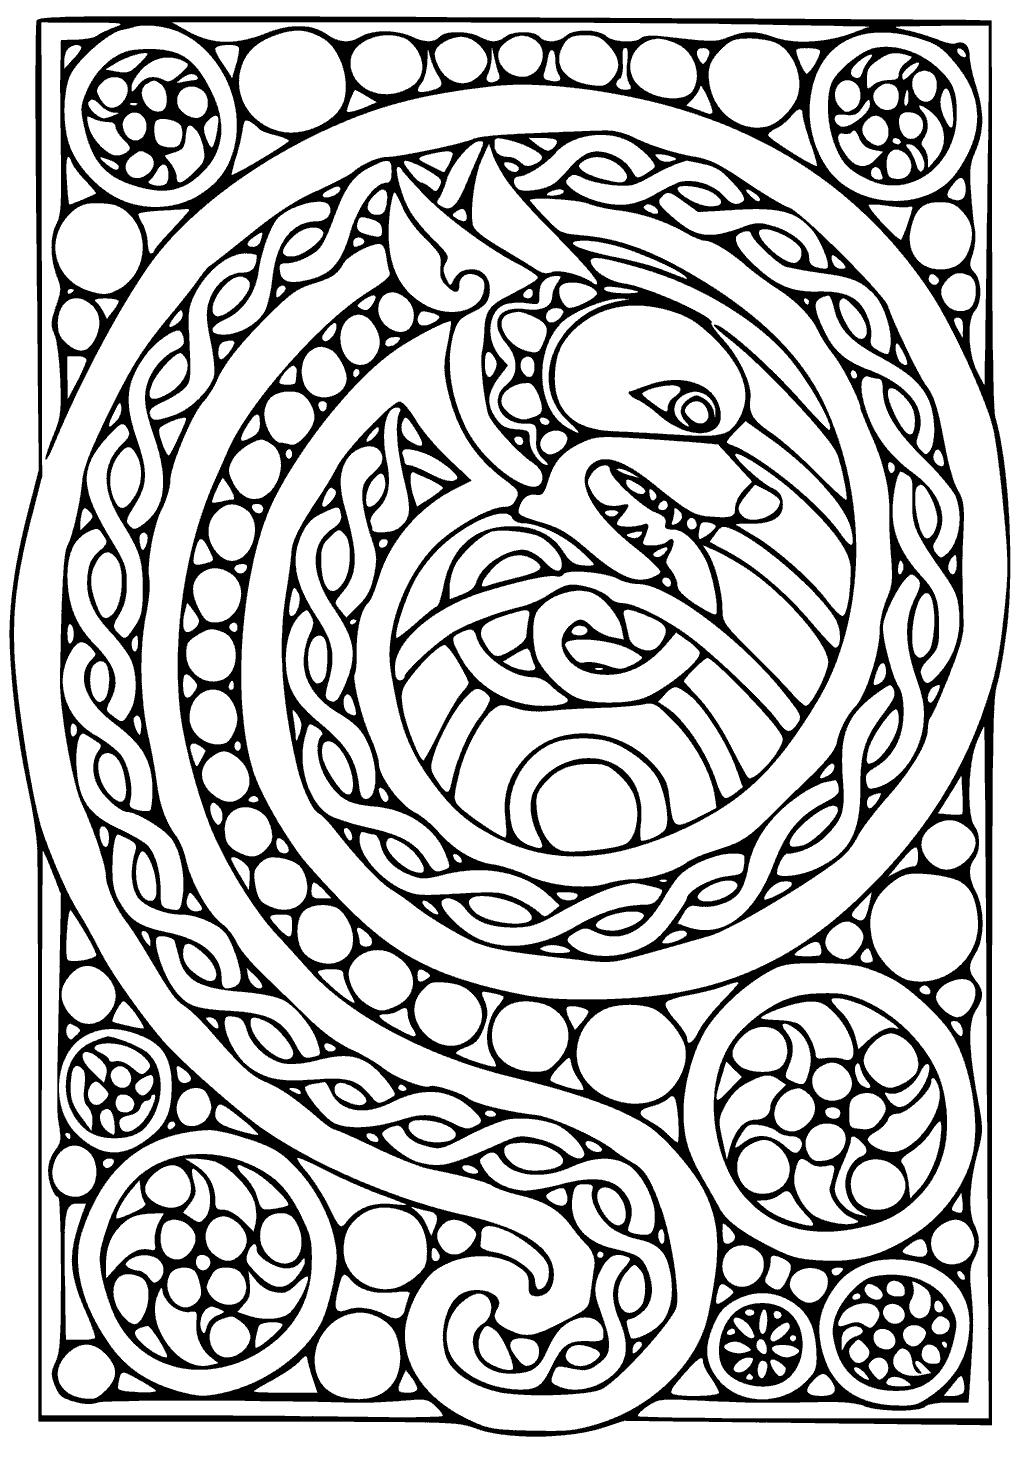 celtic coloring celtic coloring pages best coloring pages for kids celtic coloring 1 1